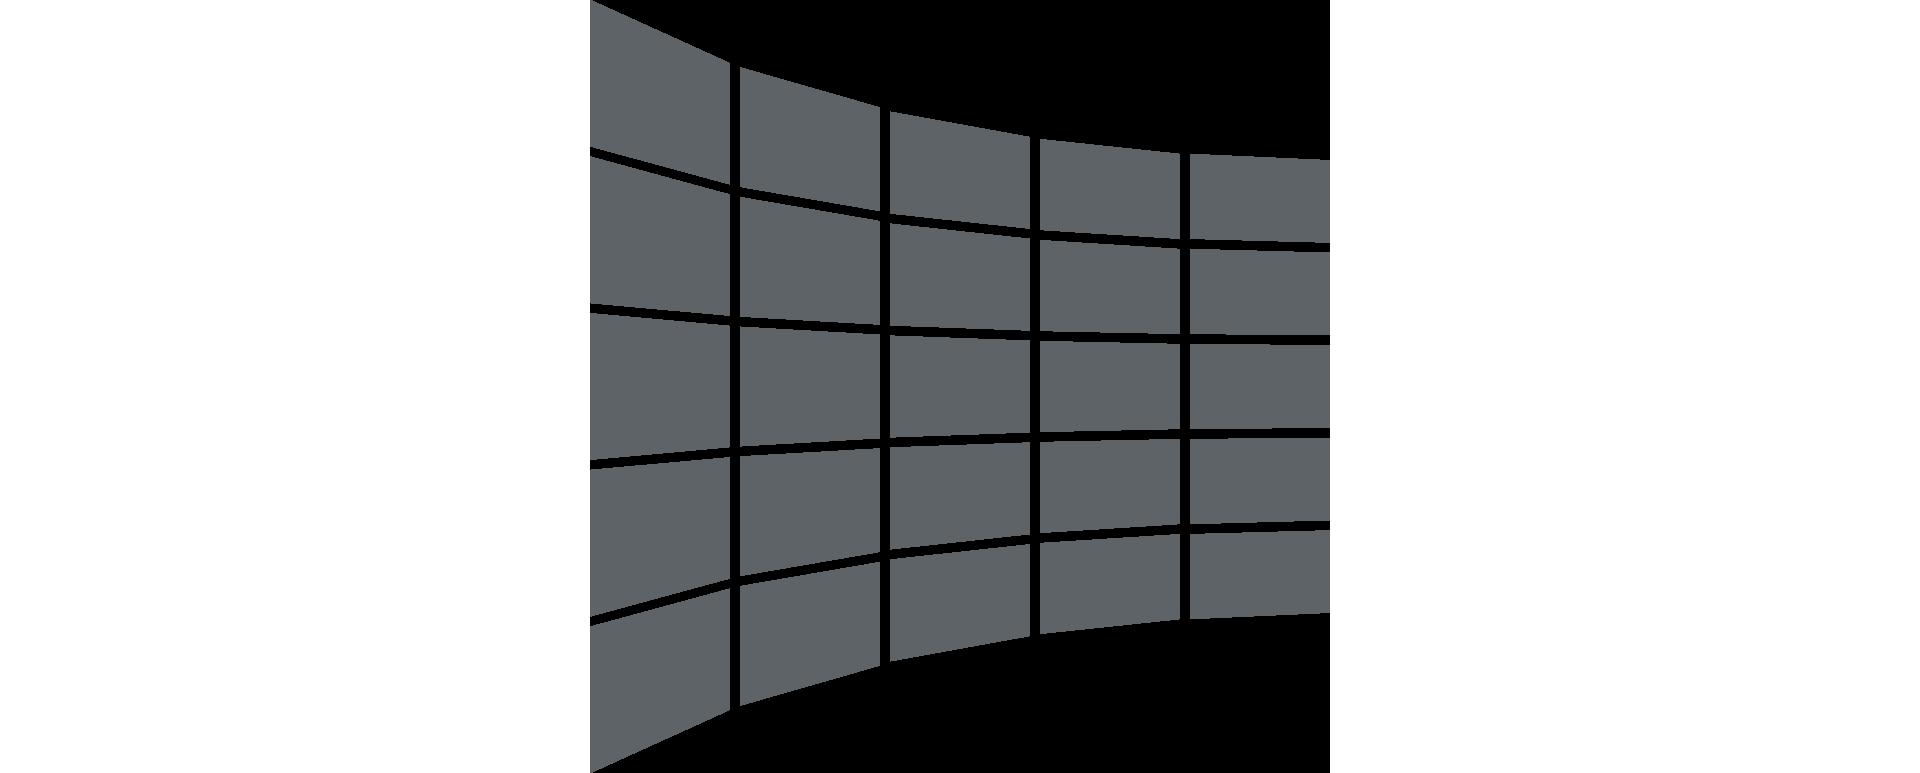 wall_ecosystem_icon